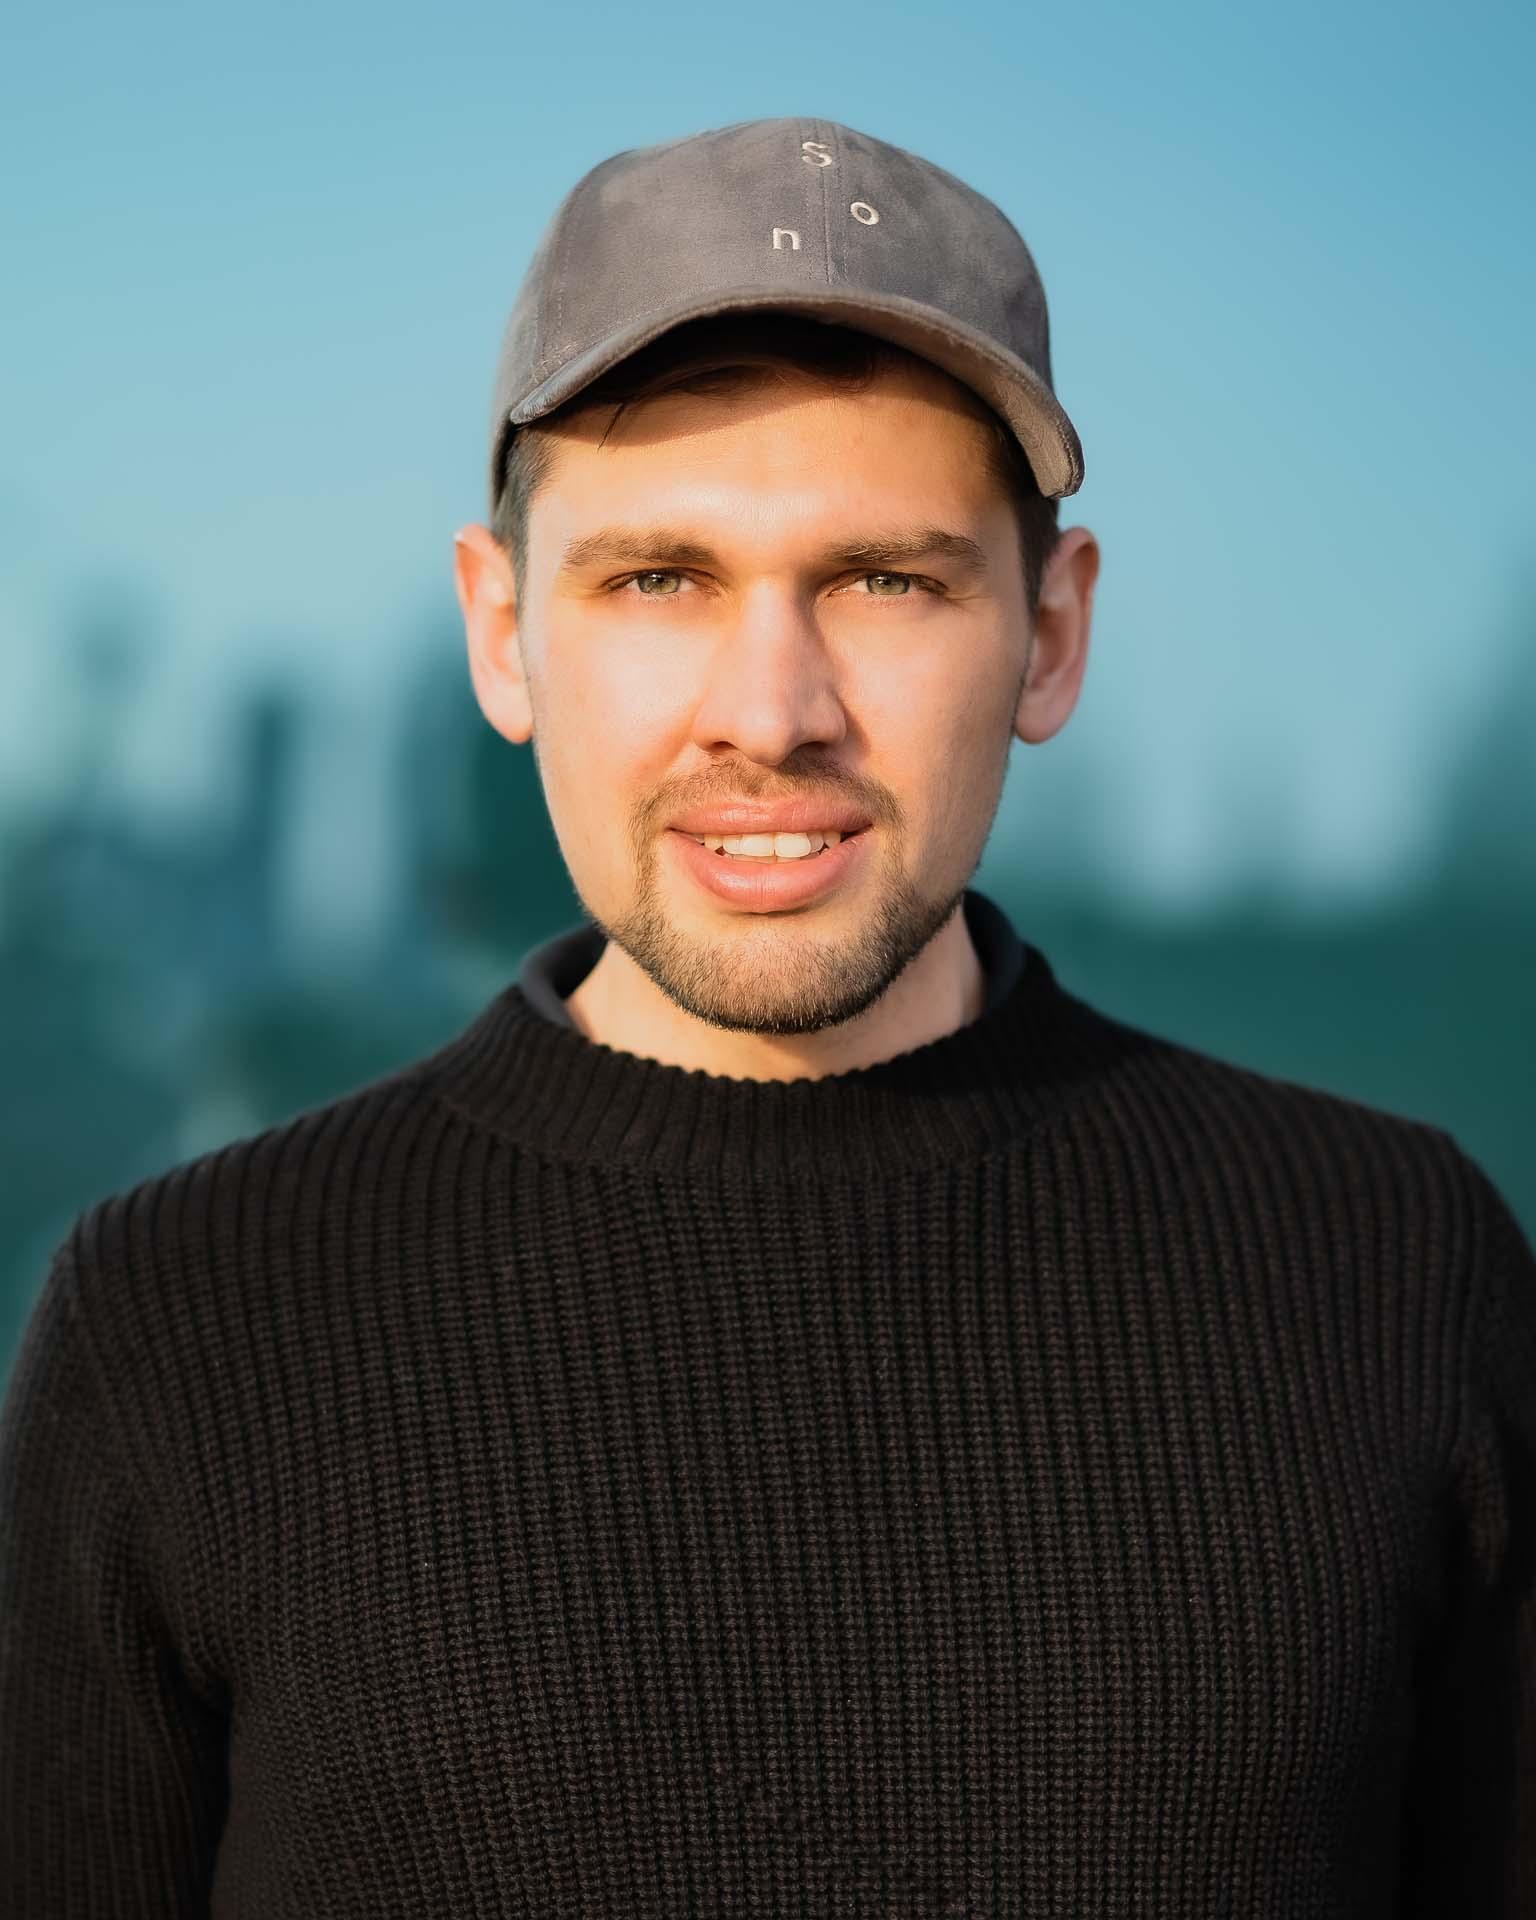 Profilfoto, Online-Dating-Dating-App, Tinder-Profil